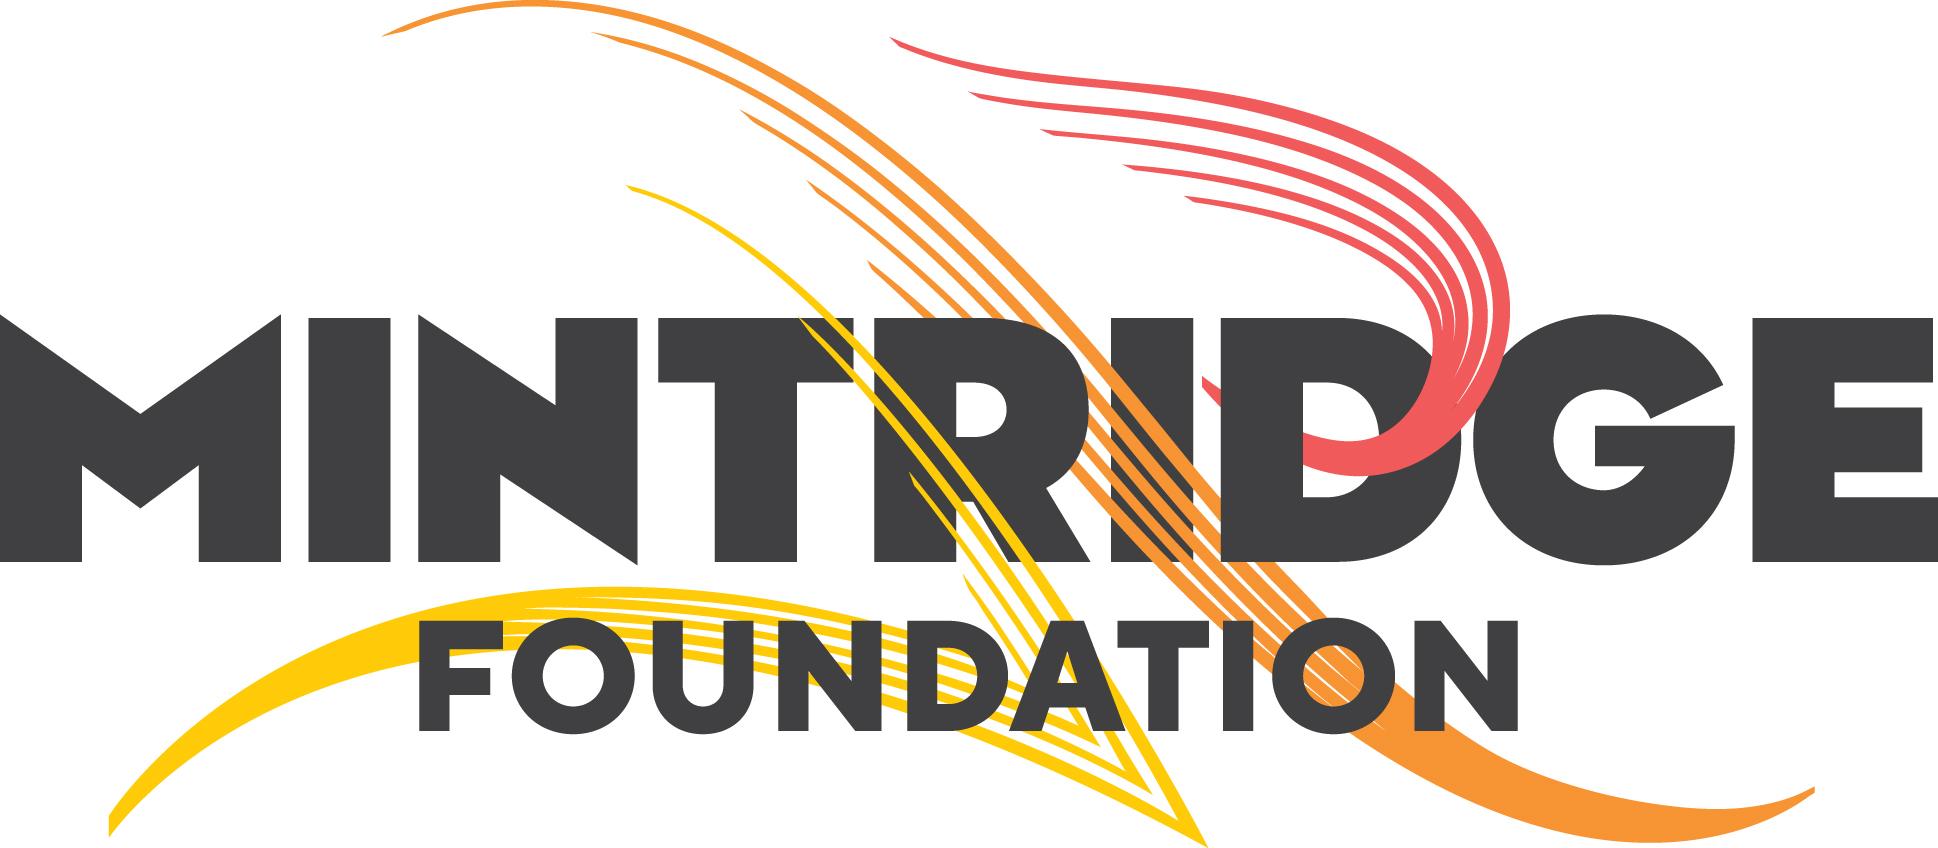 The Mintridge Foundation logo